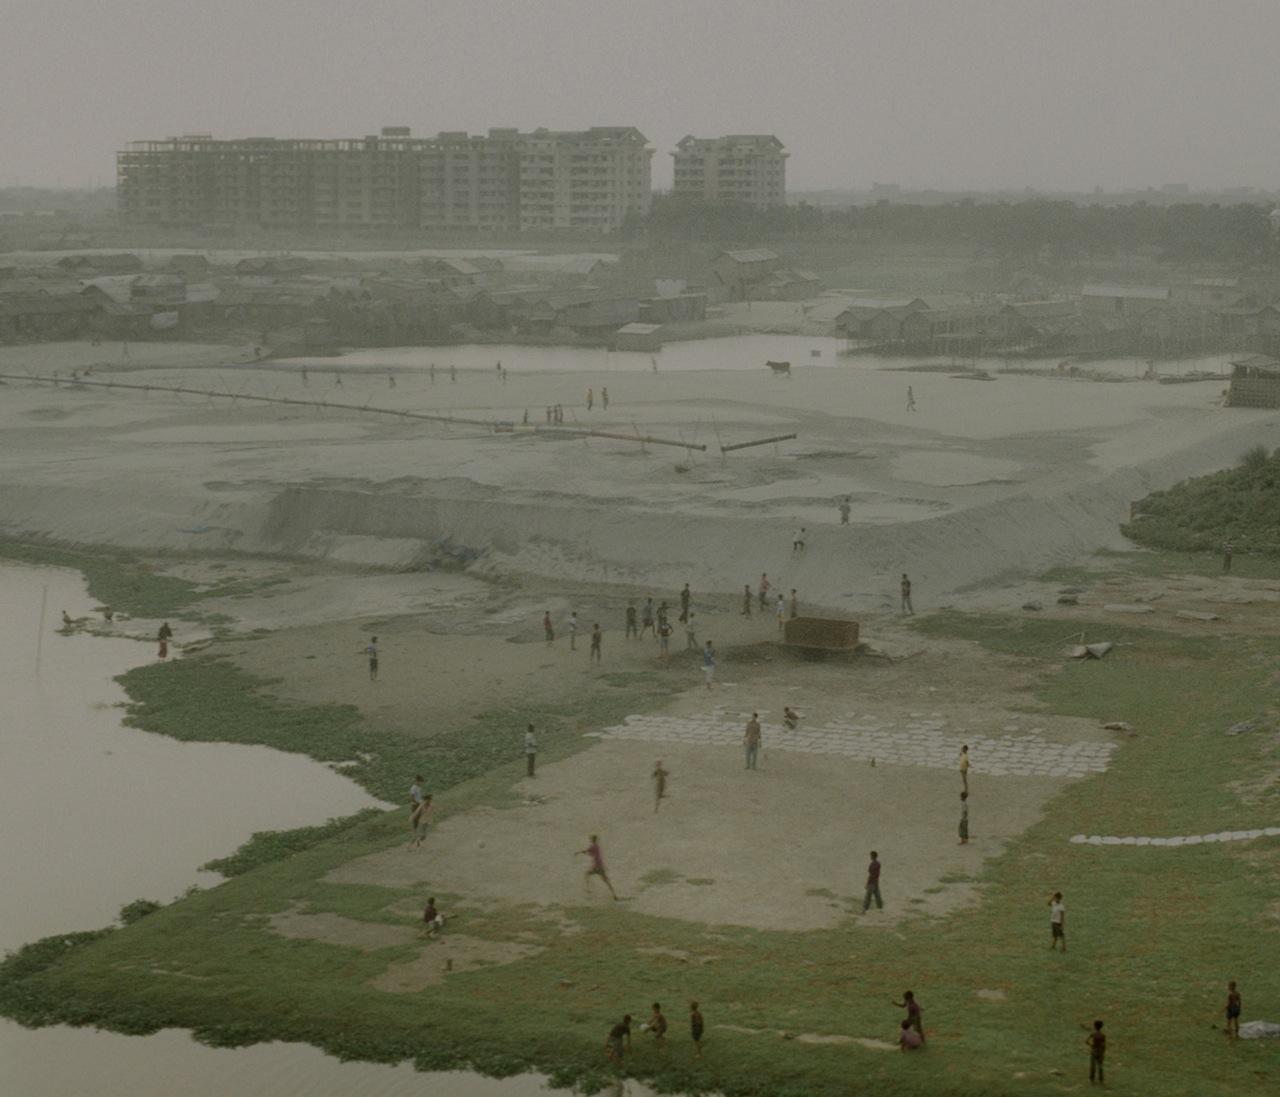 05_ Rasel Chowdhury, Hazari Bag, Dhaka (From the series 'Desperate Urbanization', 2010-14) (5)